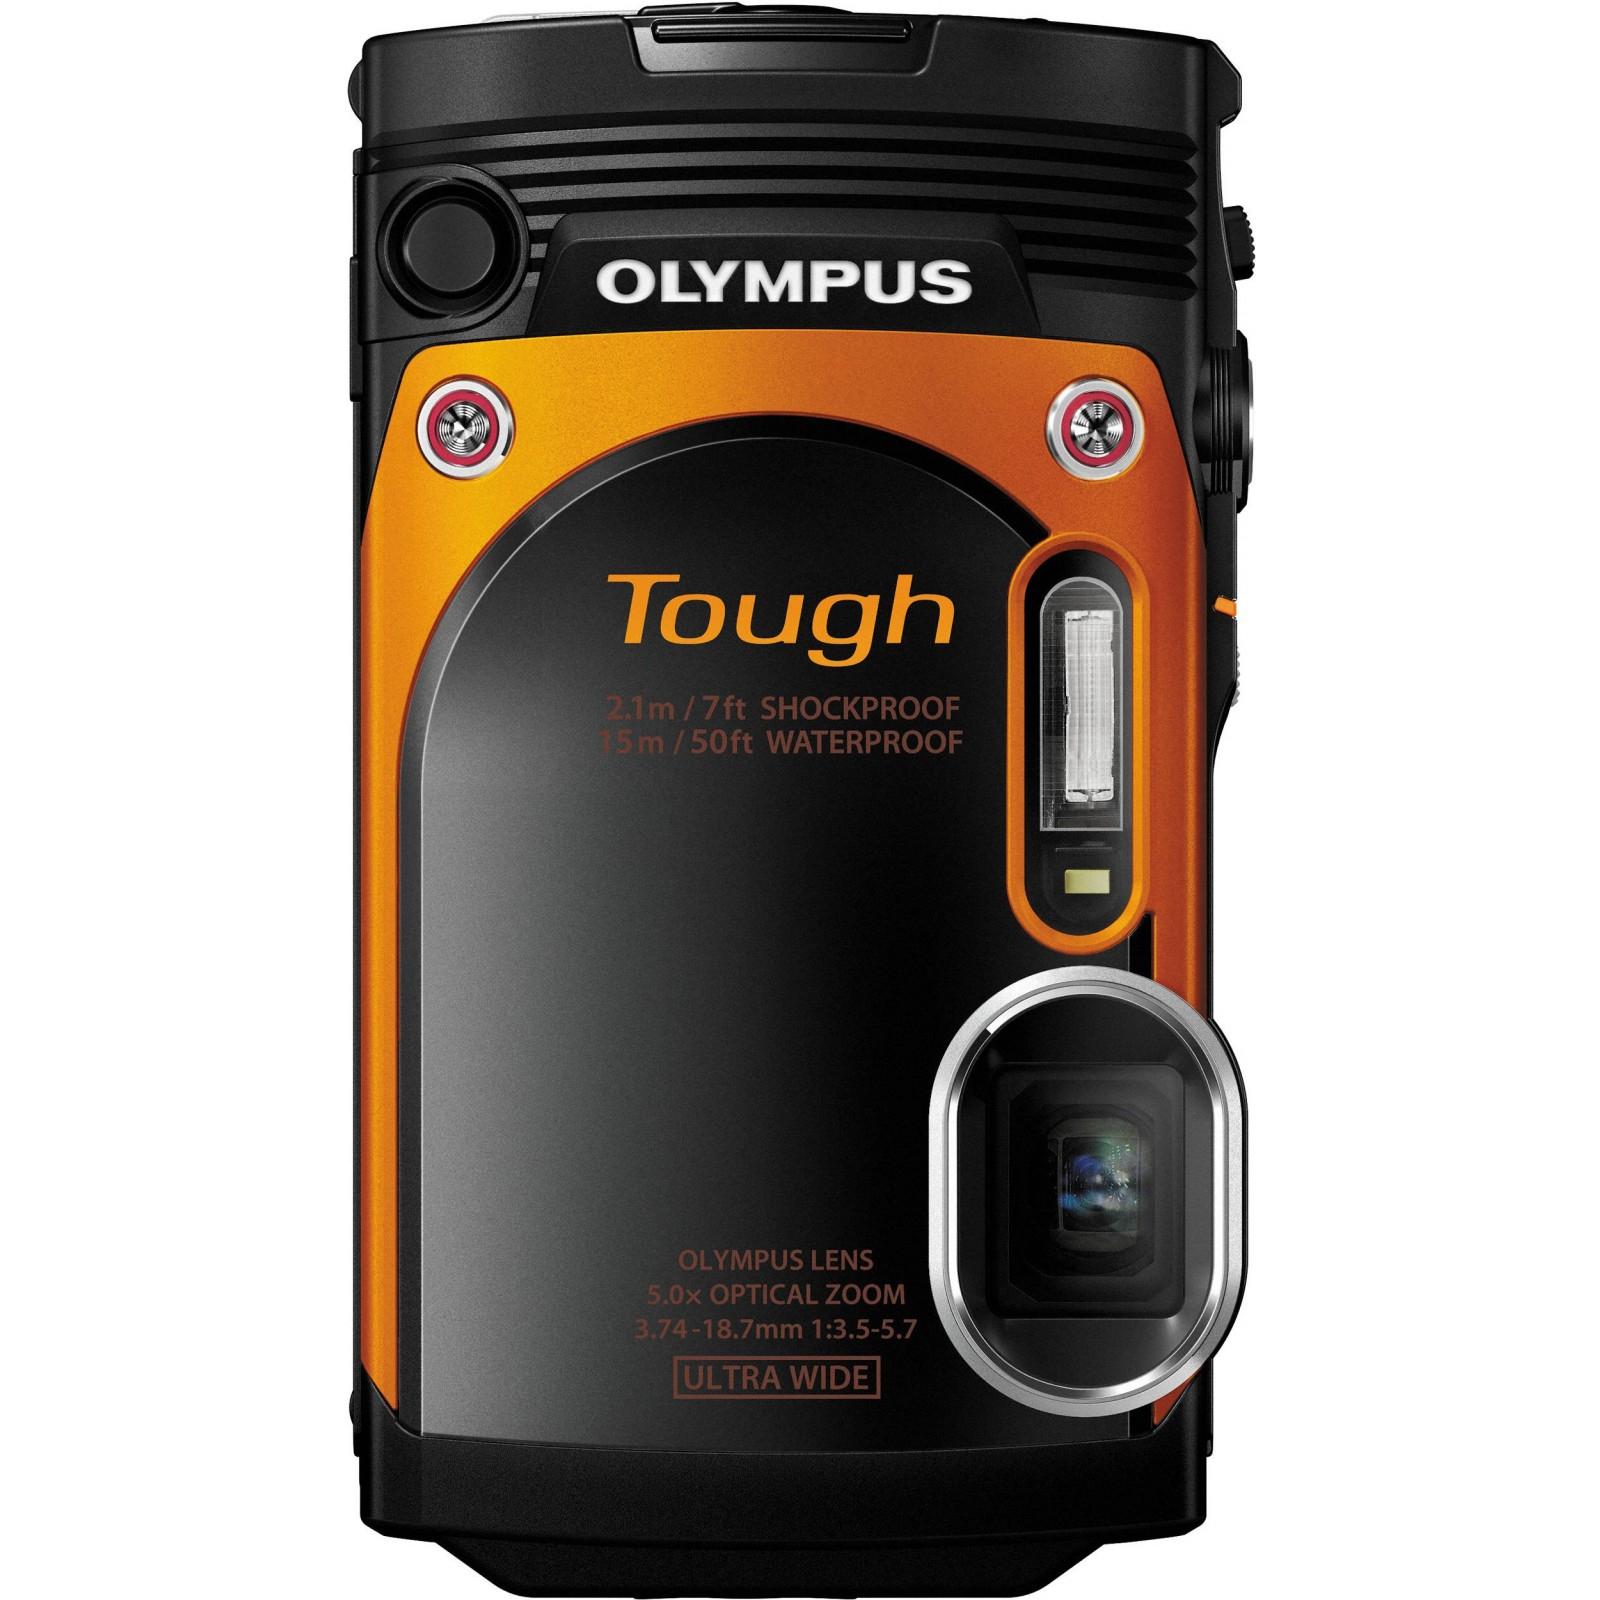 Цифровой фотоаппарат OLYMPUS TG-860 Orange (Waterproof - 15m; iHS; Wi-Fi) (V104170OE000) изображение 11